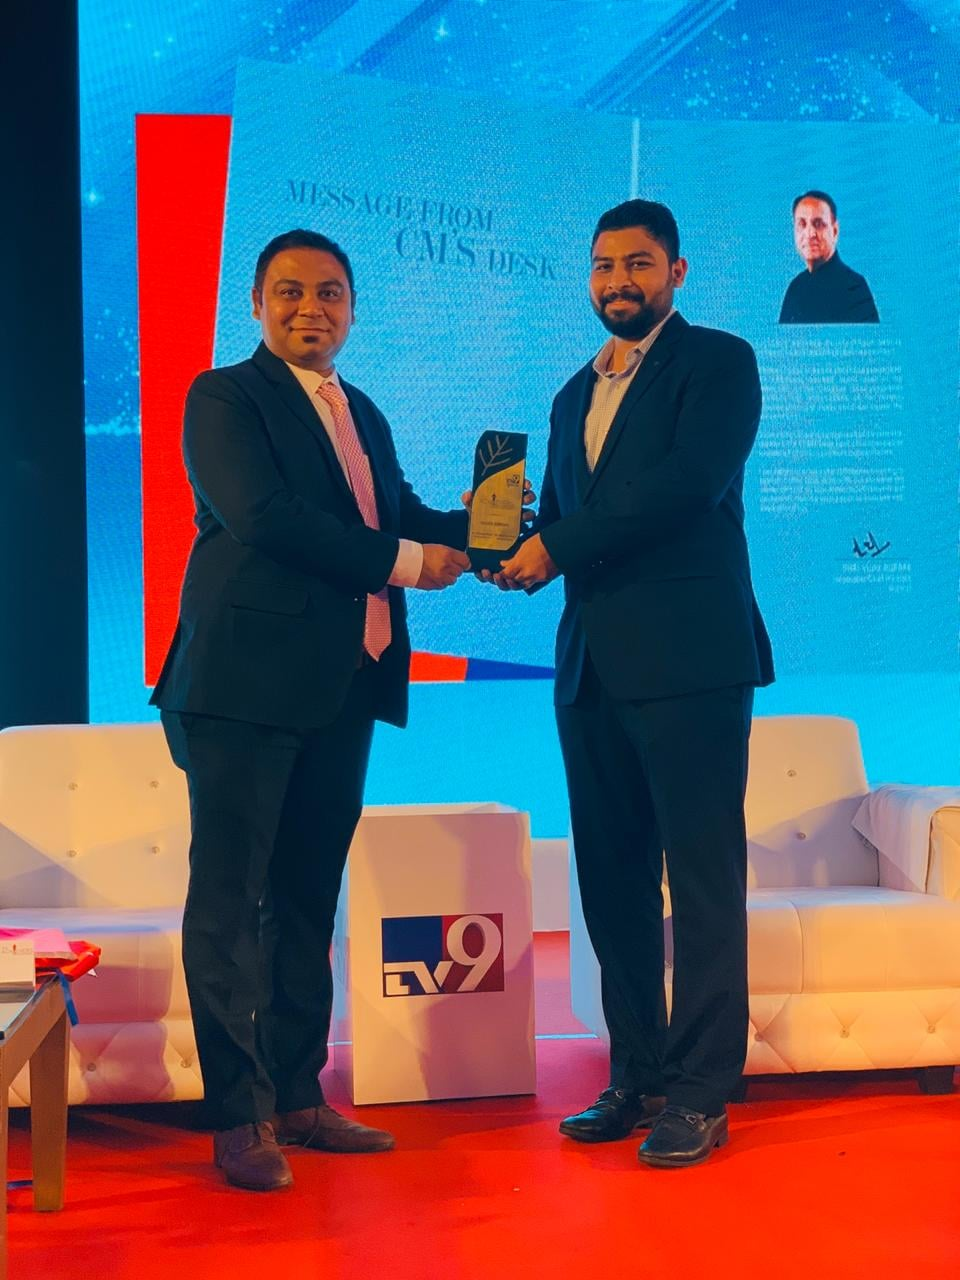 TV9 Ace Achievers Award Received By Bhargav Modi & Chintan Modi